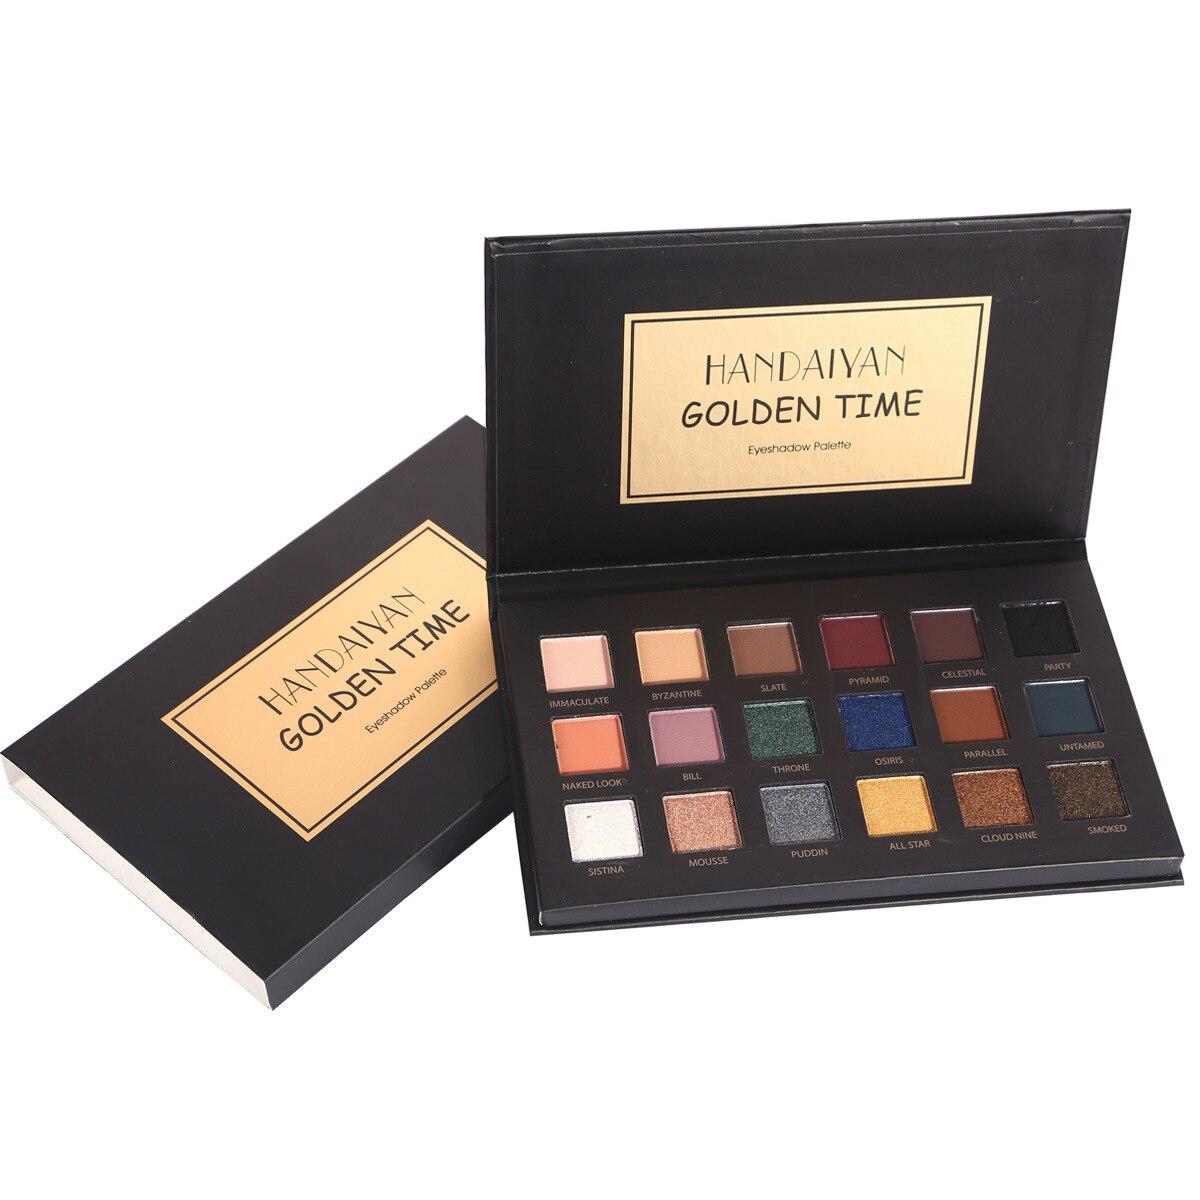 HANDAIYAN 18 Colors Smoky Earth Matte Shimmer Eyeshadow Pallete For Women Beauty Makeup Cosmetics Palette Drop Shipping